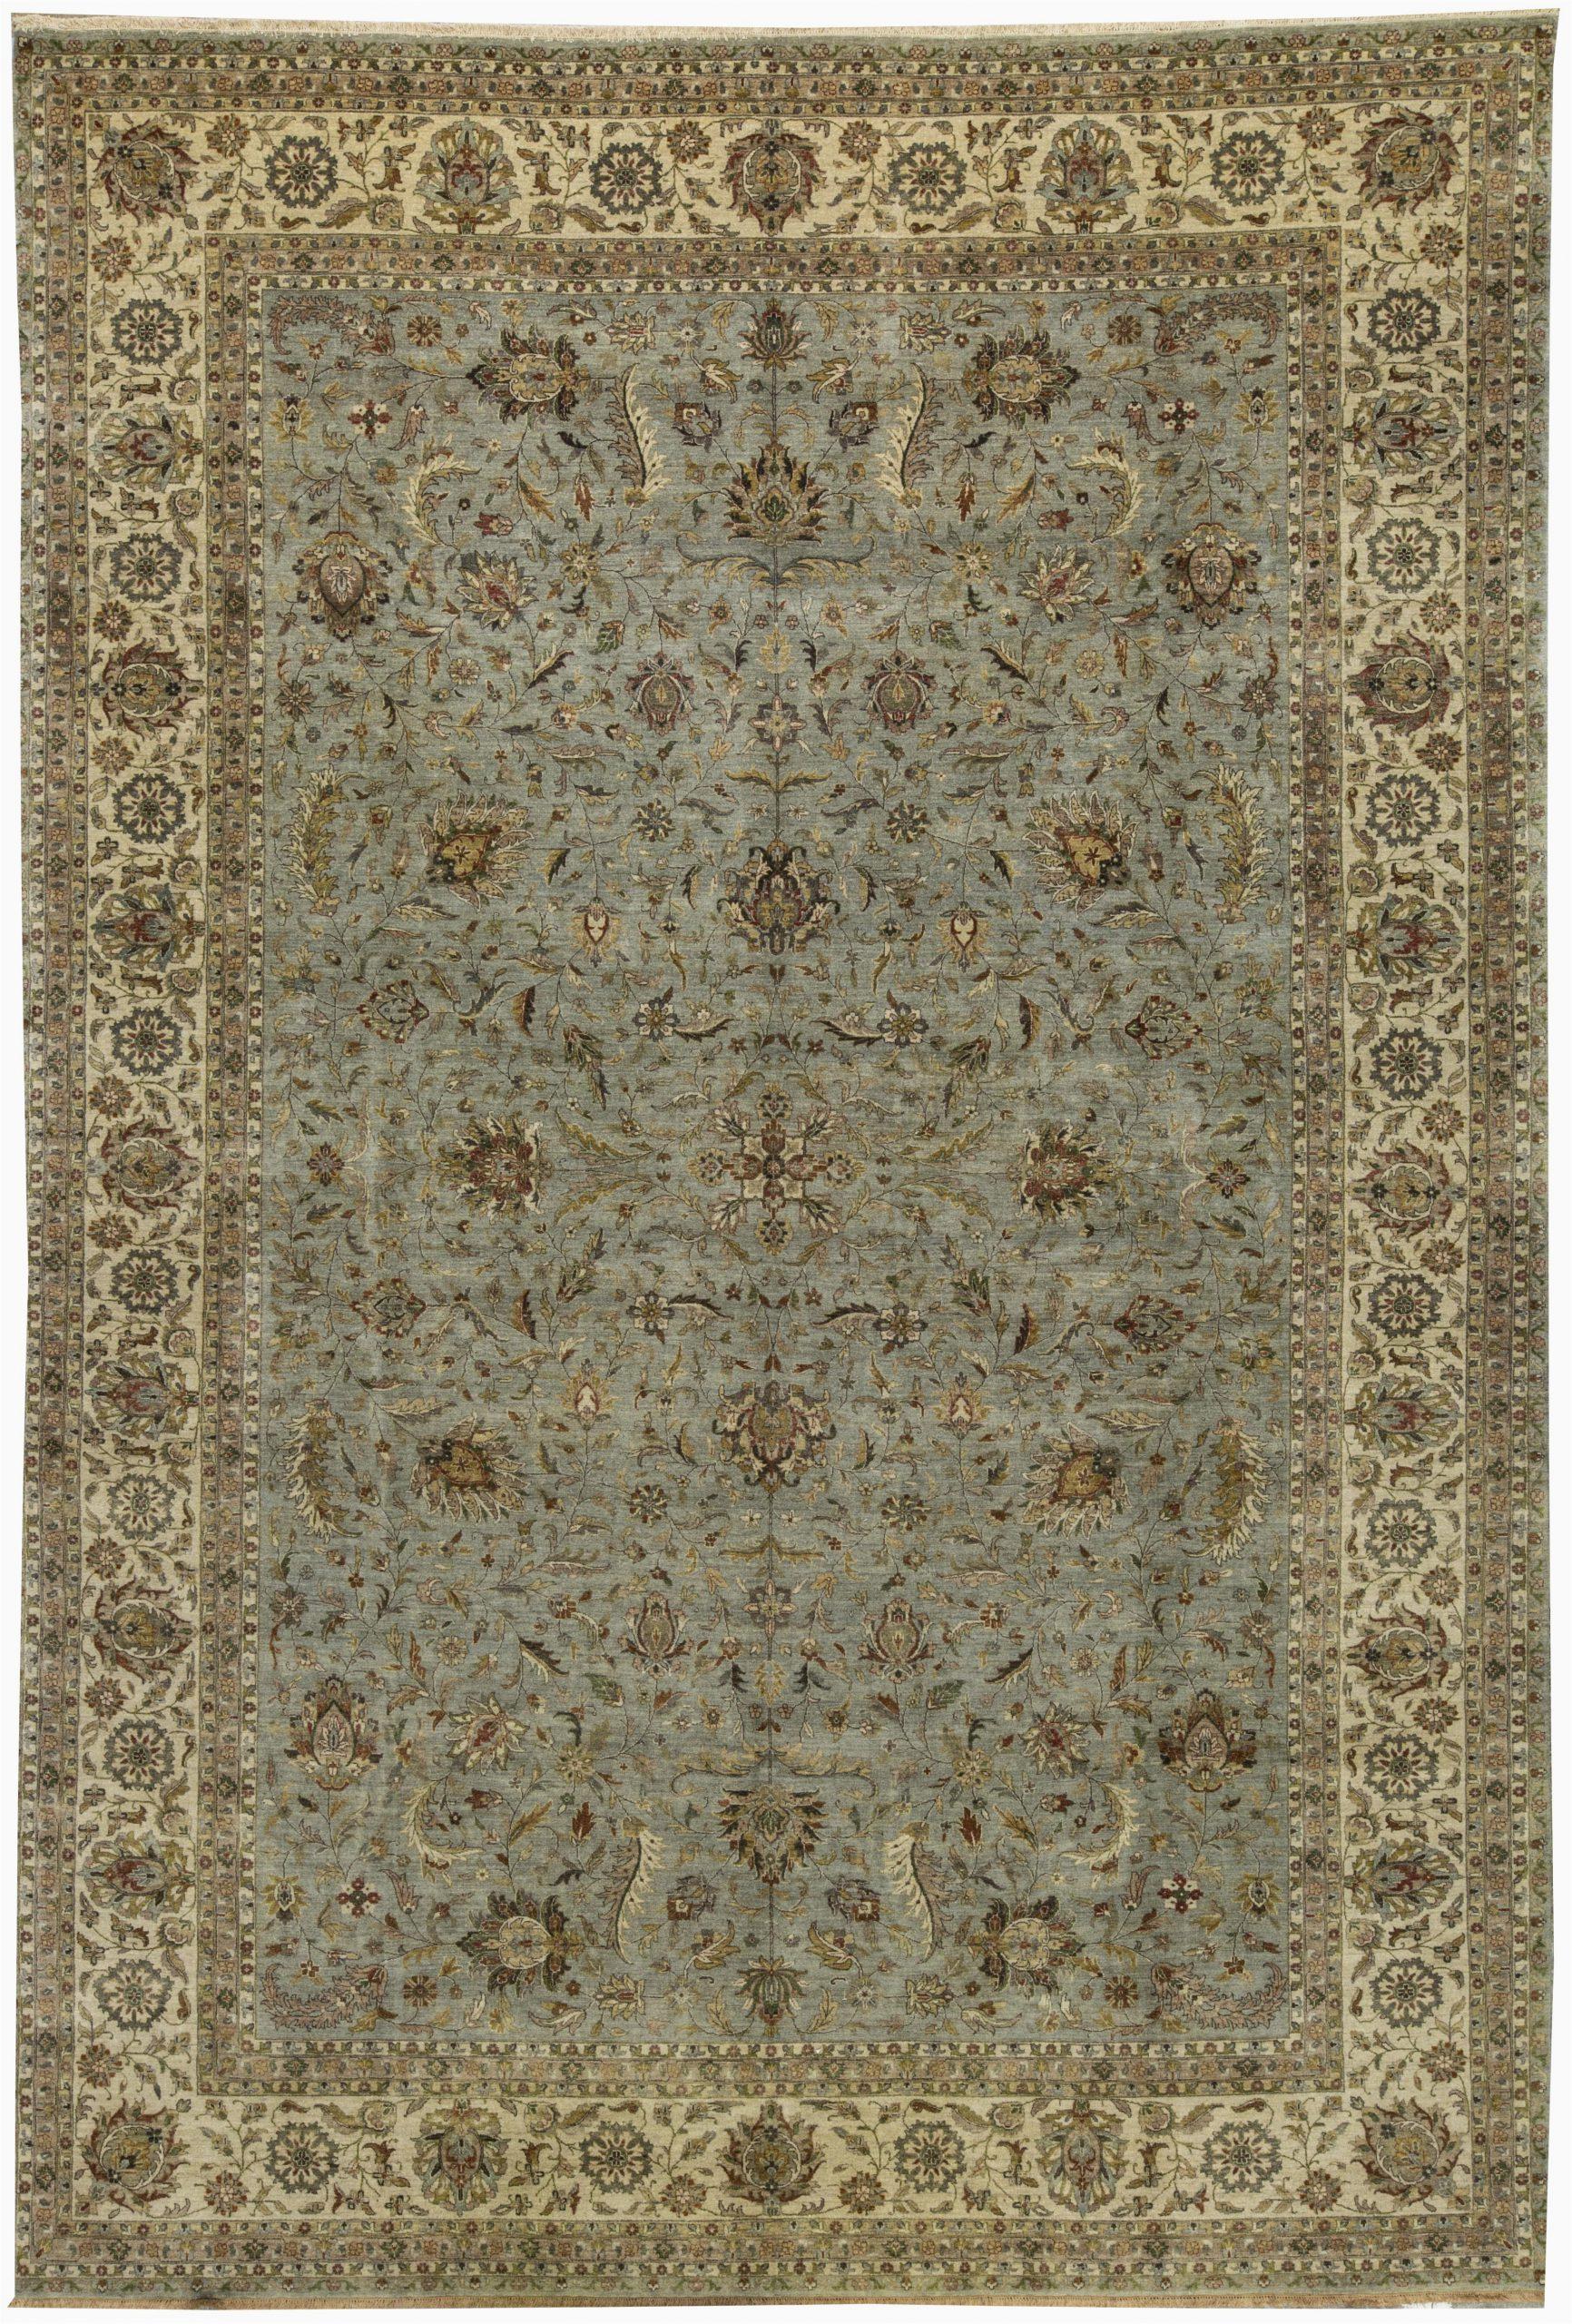 bokara rug co inc one of a kind aberdeen handwoven 117 x 175 wool bluebeige area rug abhd2539